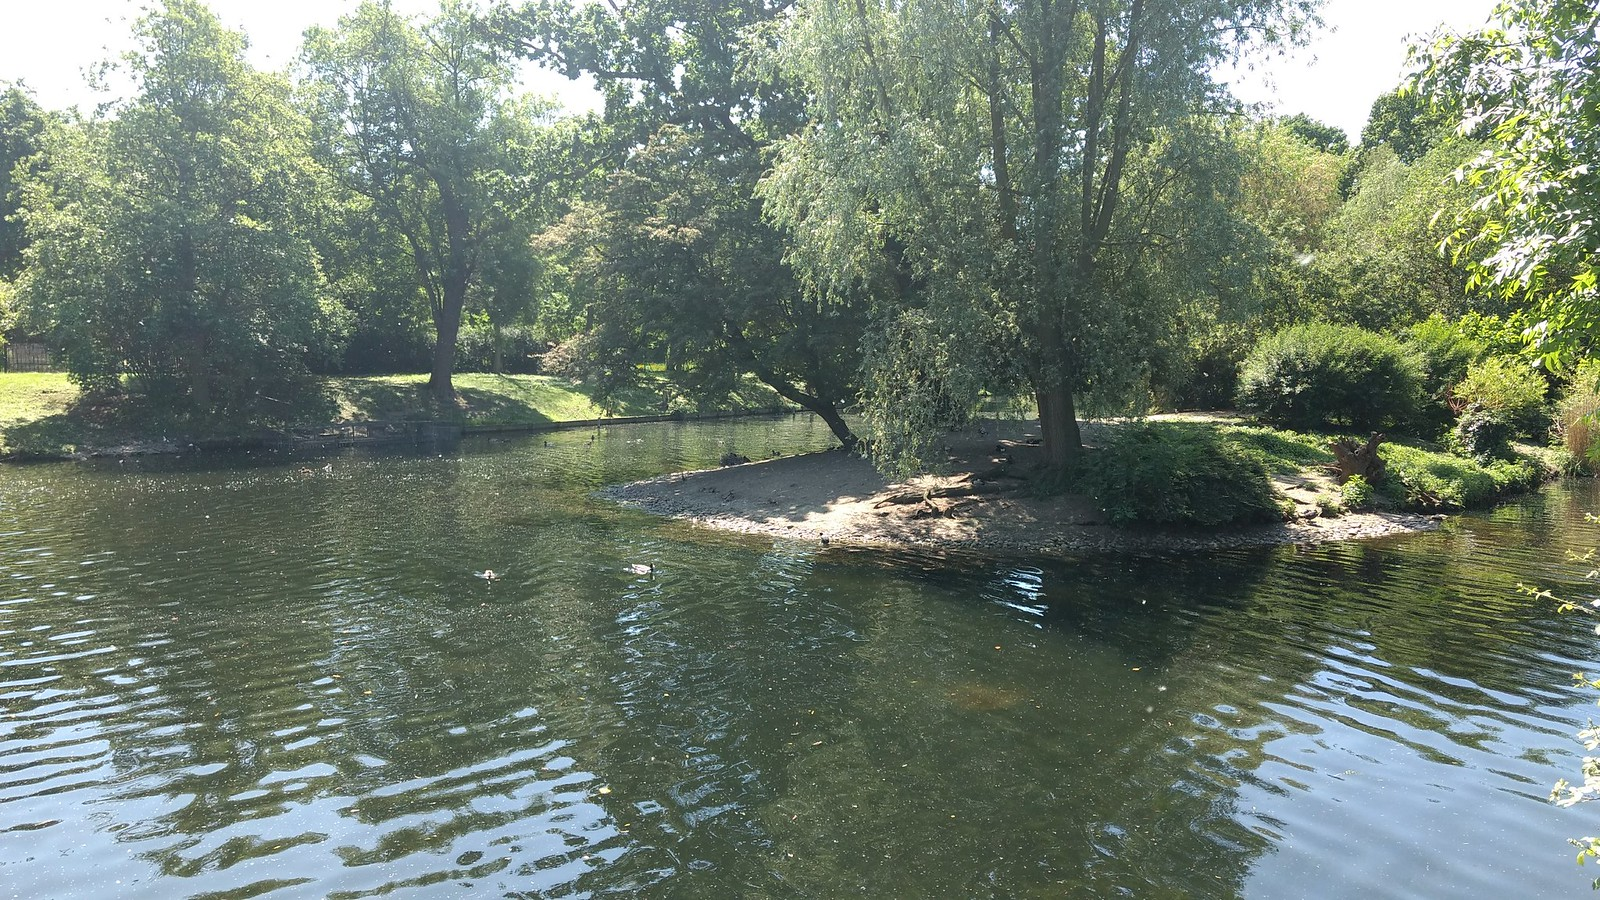 Regents Park Lake